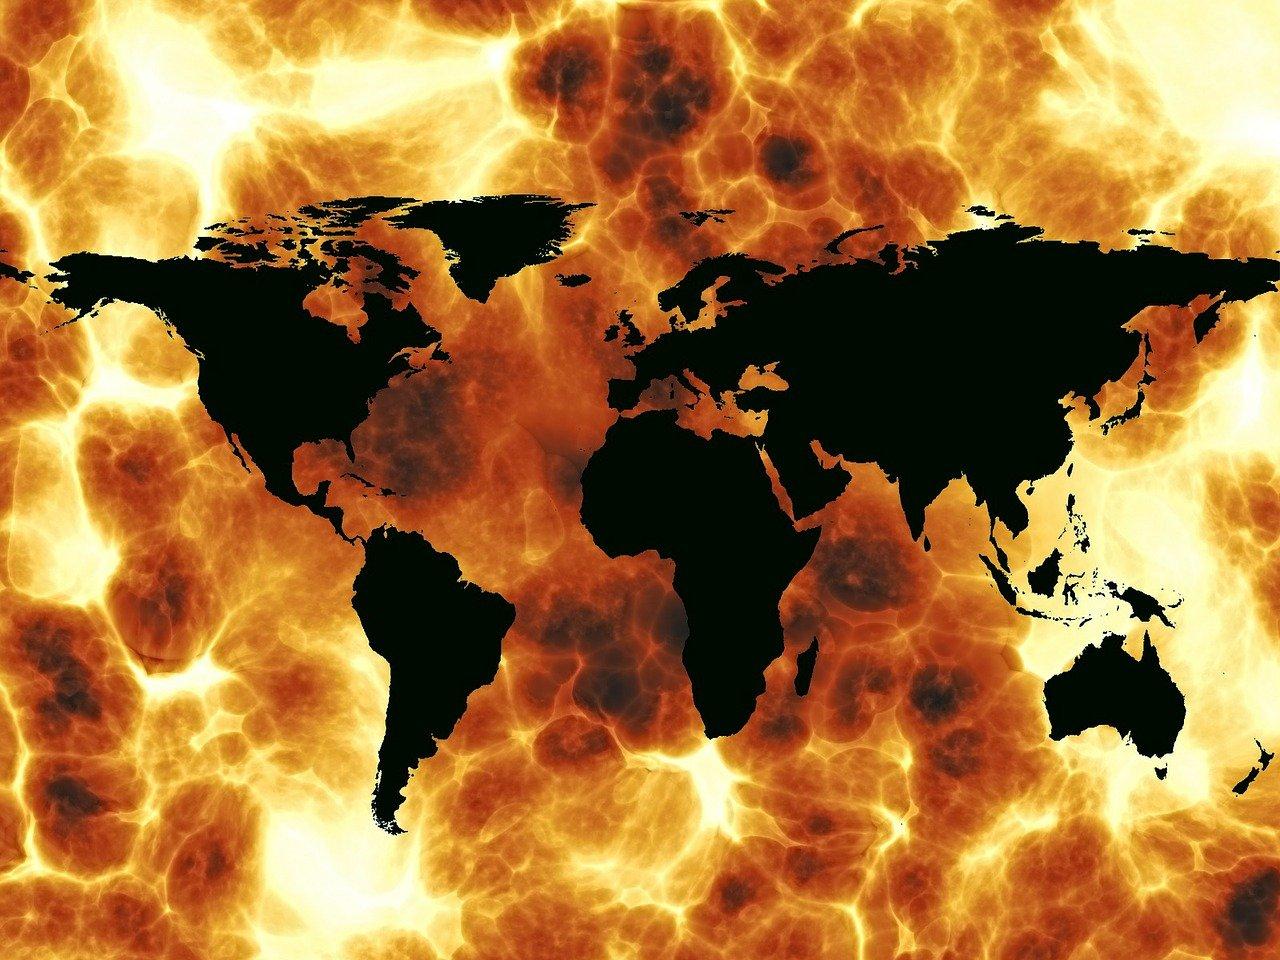 fire, explosion, global-102450.jpg